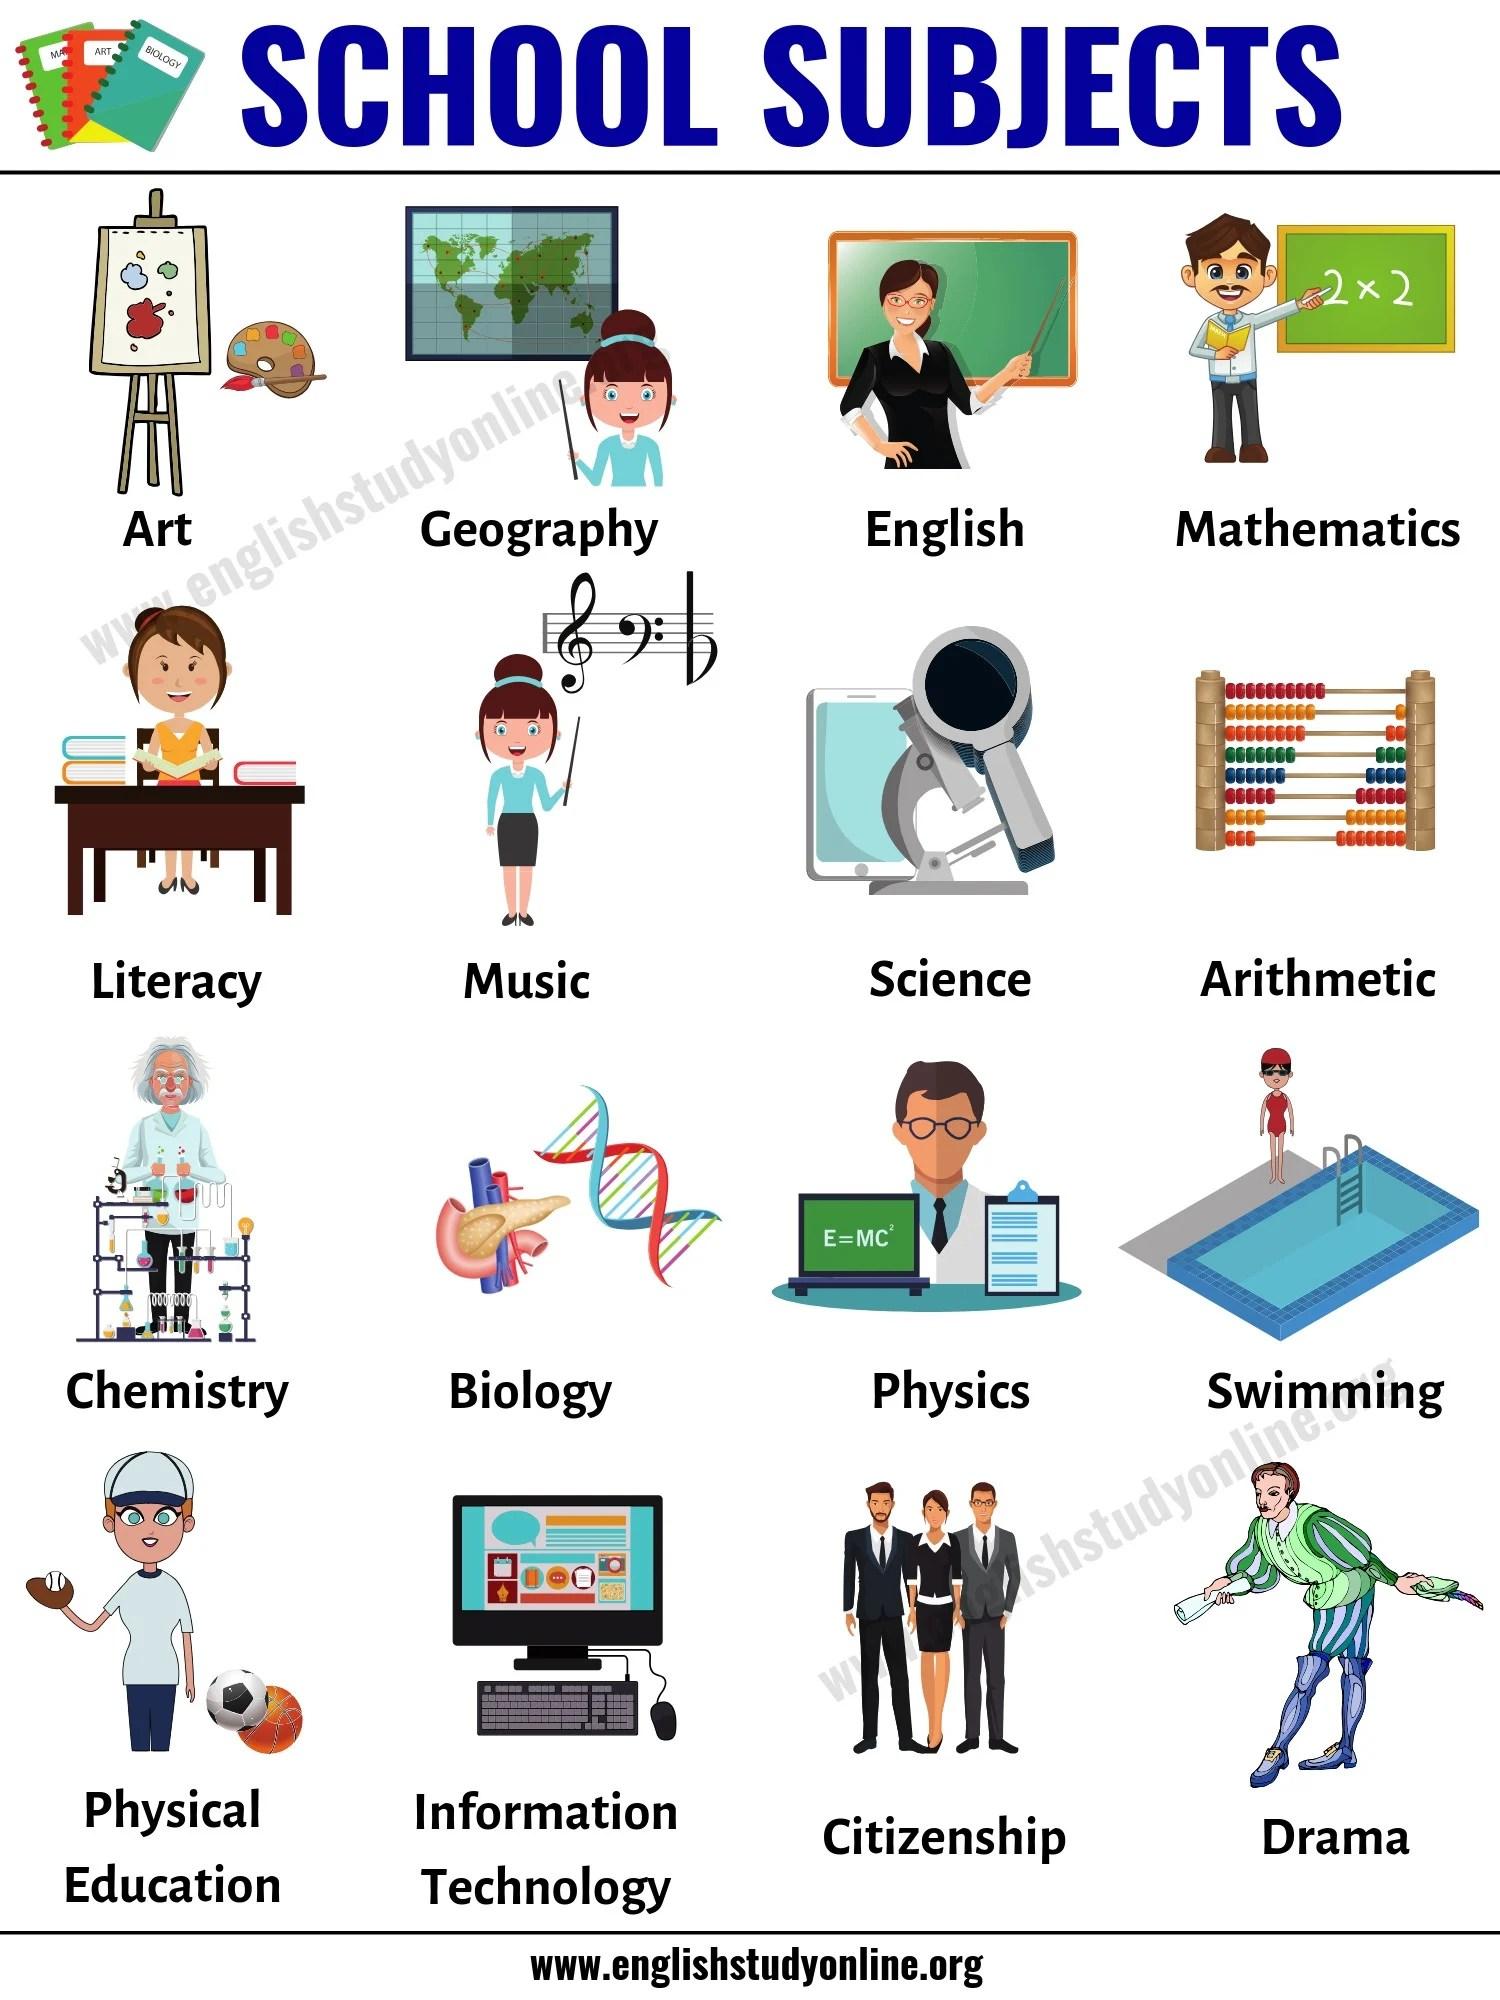 School Subjects Learn 16 Popular Names Of School Subjects